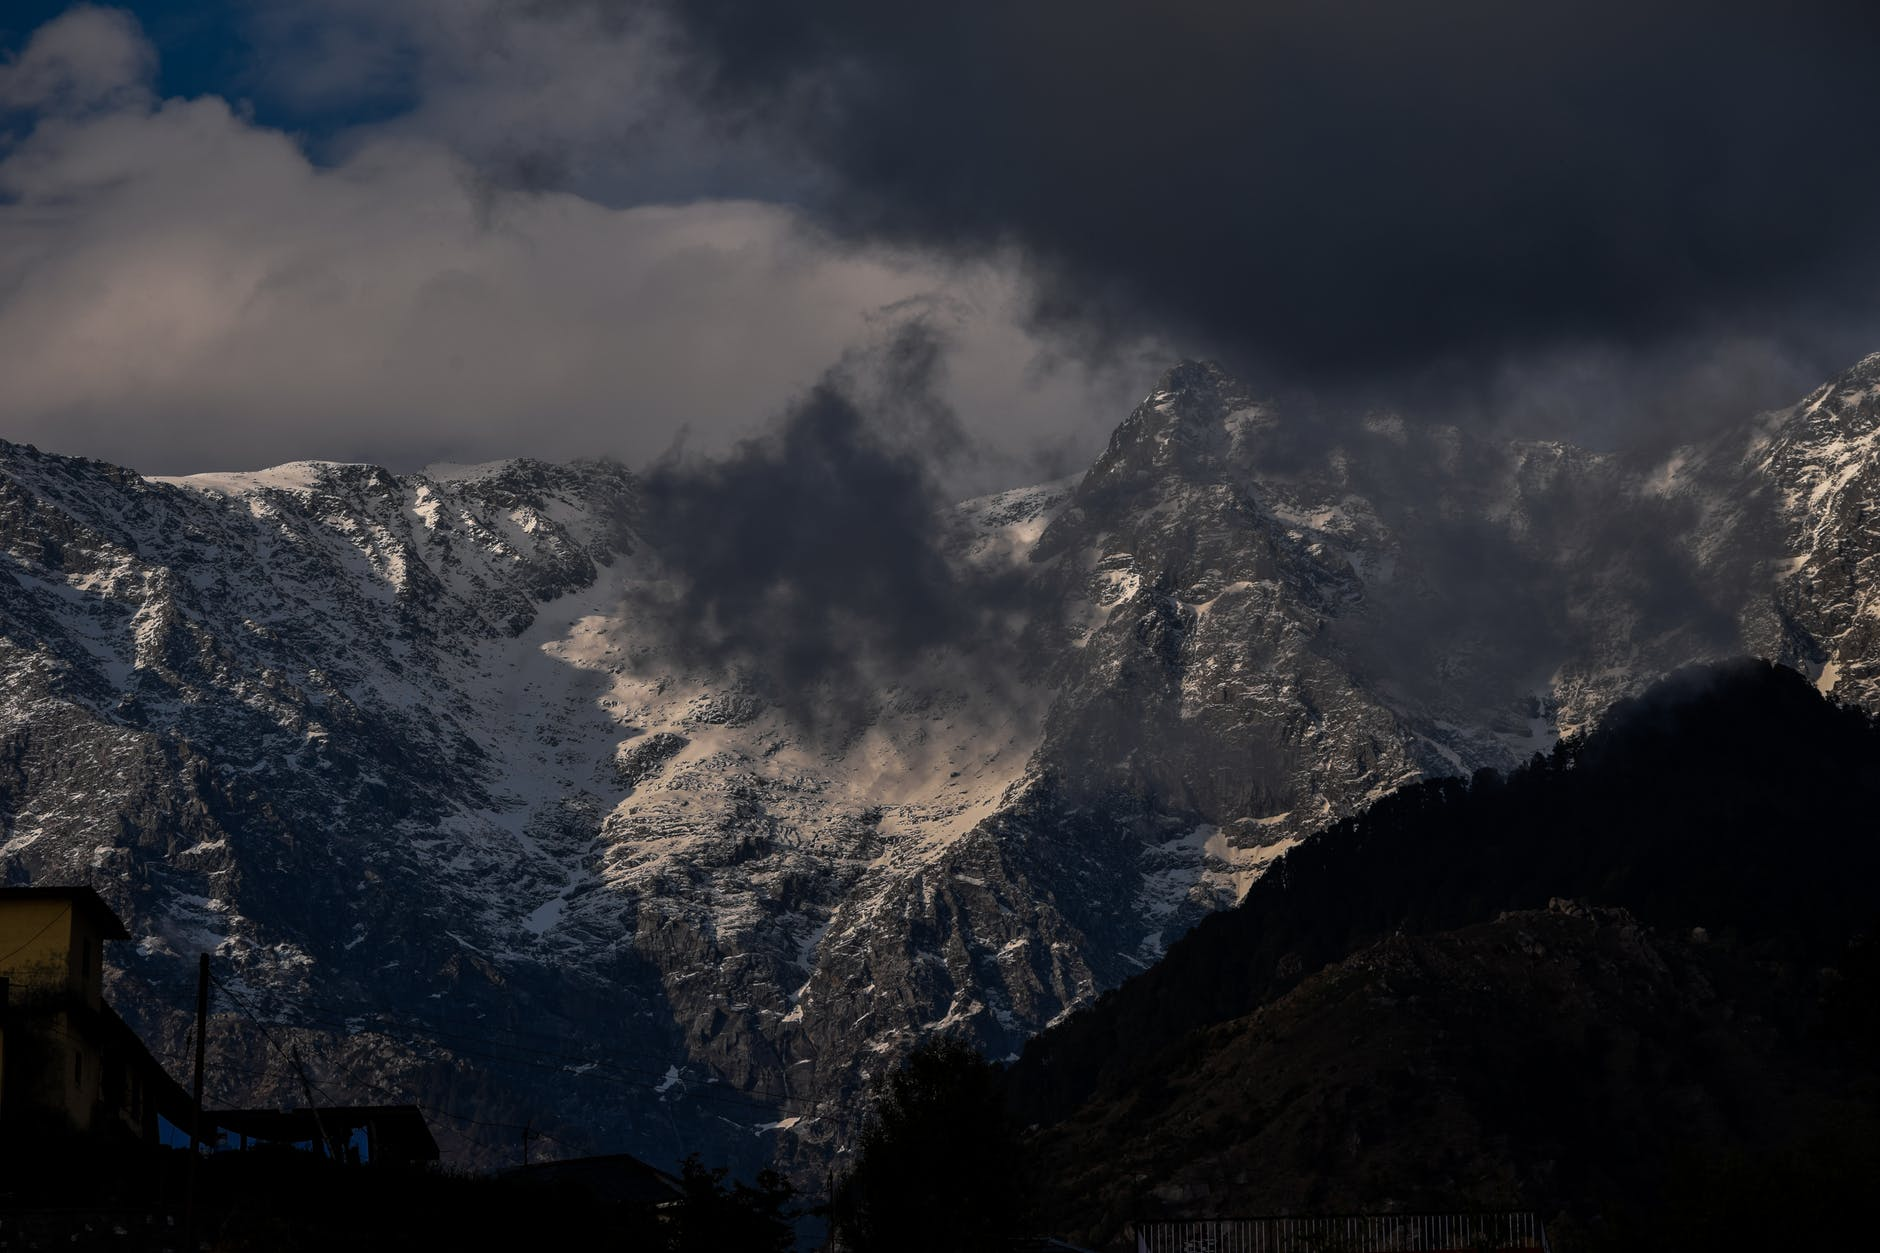 snowy mountain peaks under cloudy sky